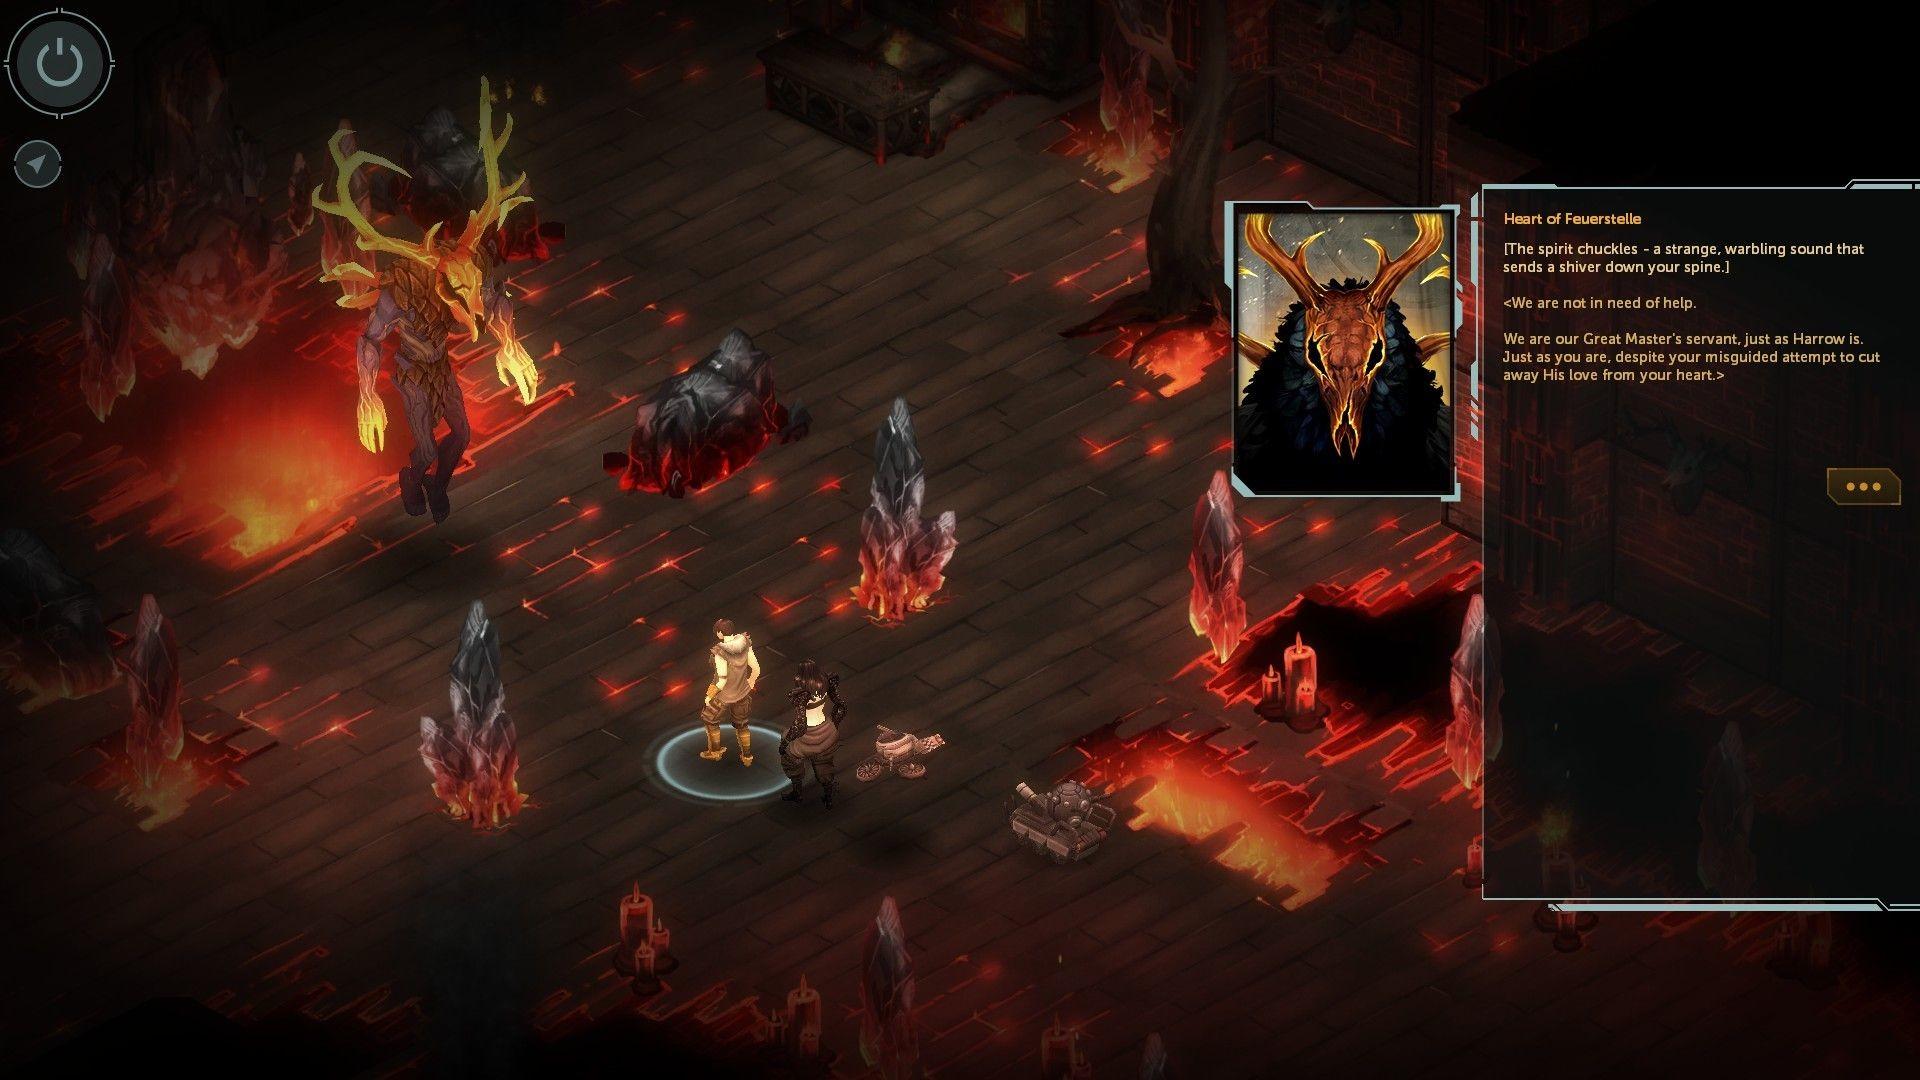 dragonfall_satan